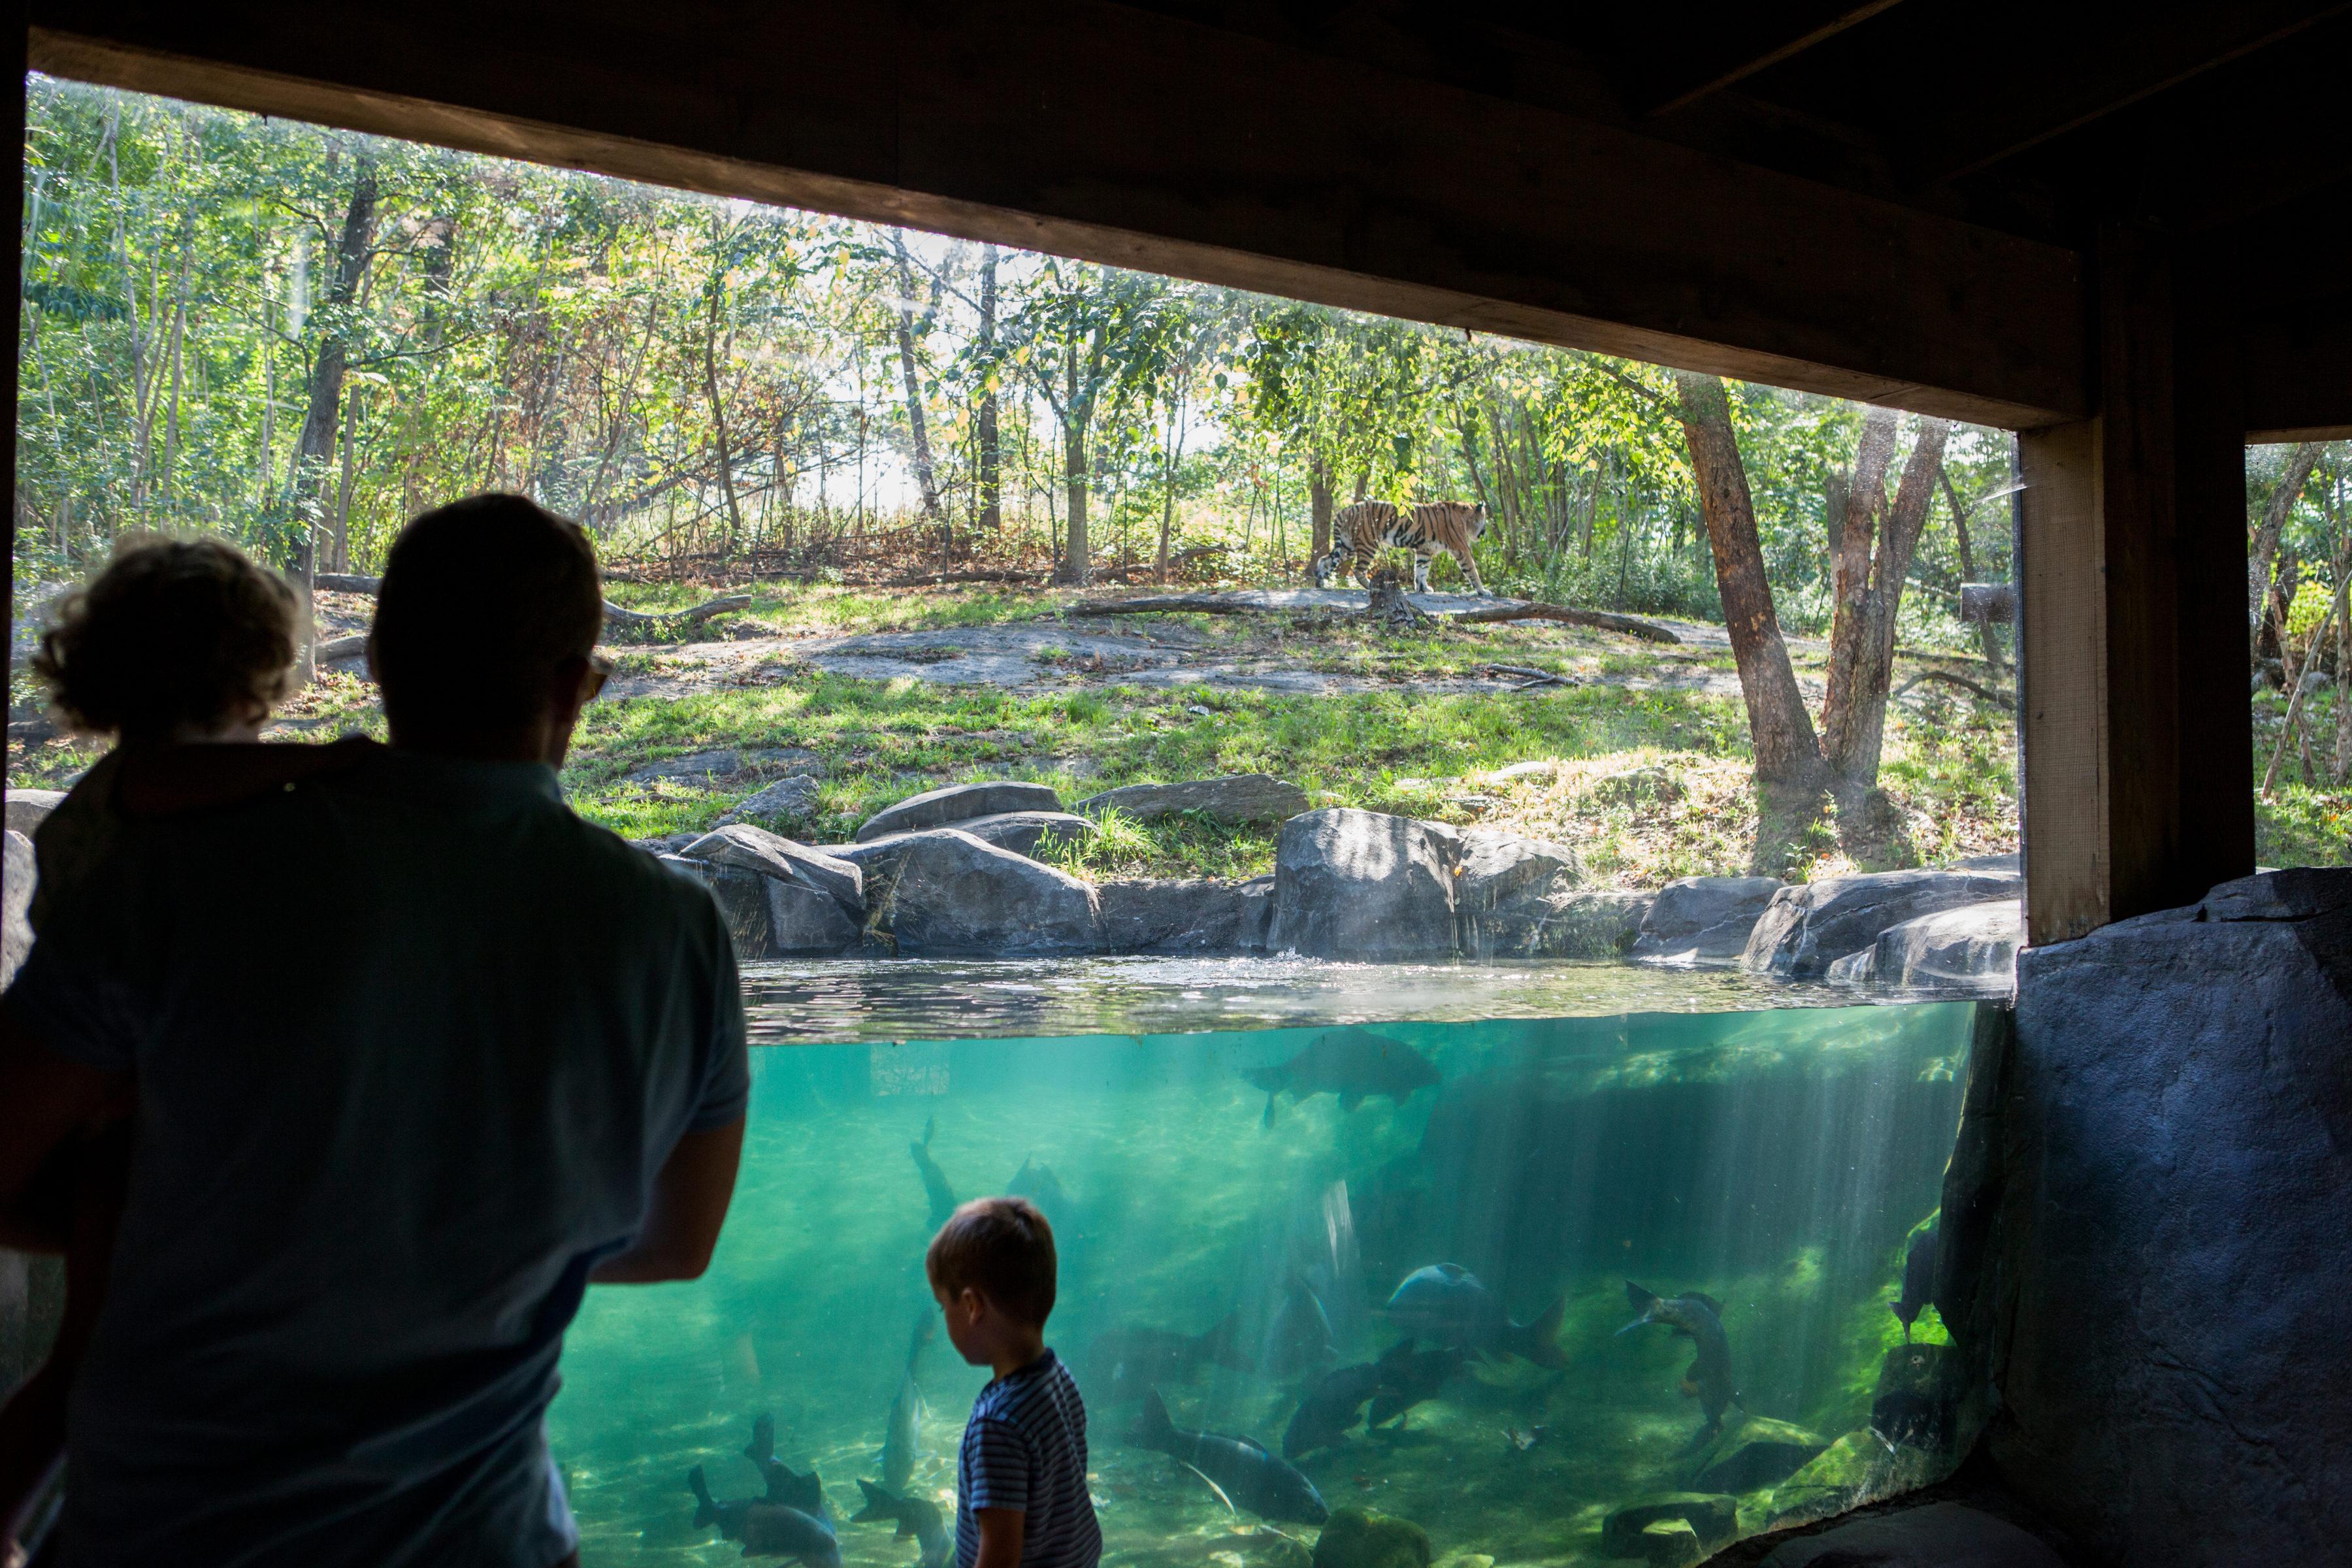 Bronx Zoo Bronx Ny 10460 New York Path Through History